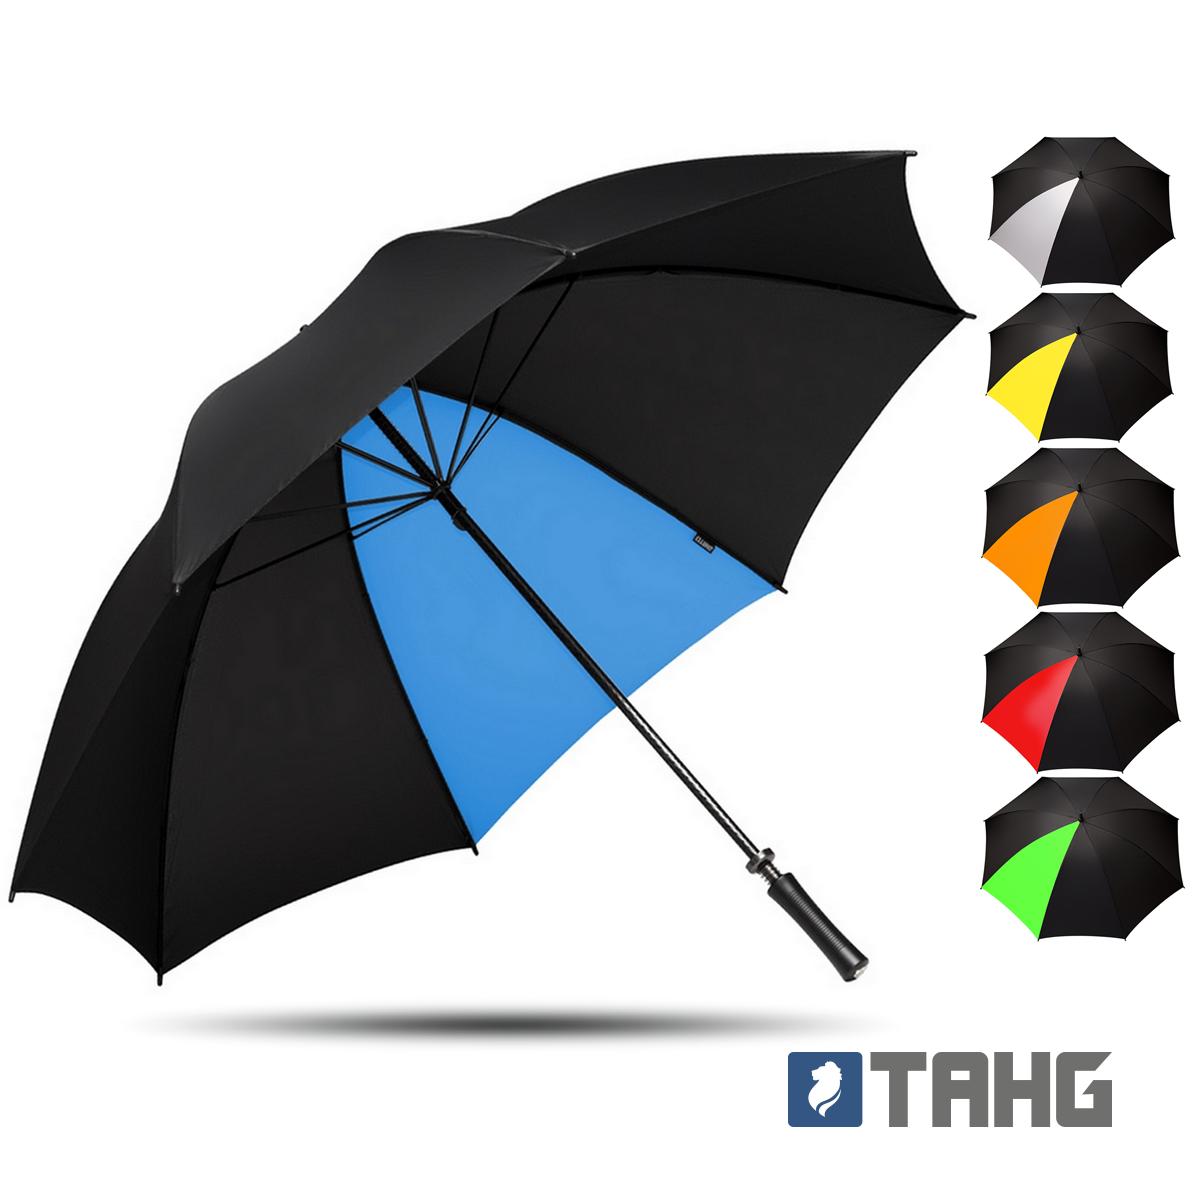 Paraguas TAHG 131